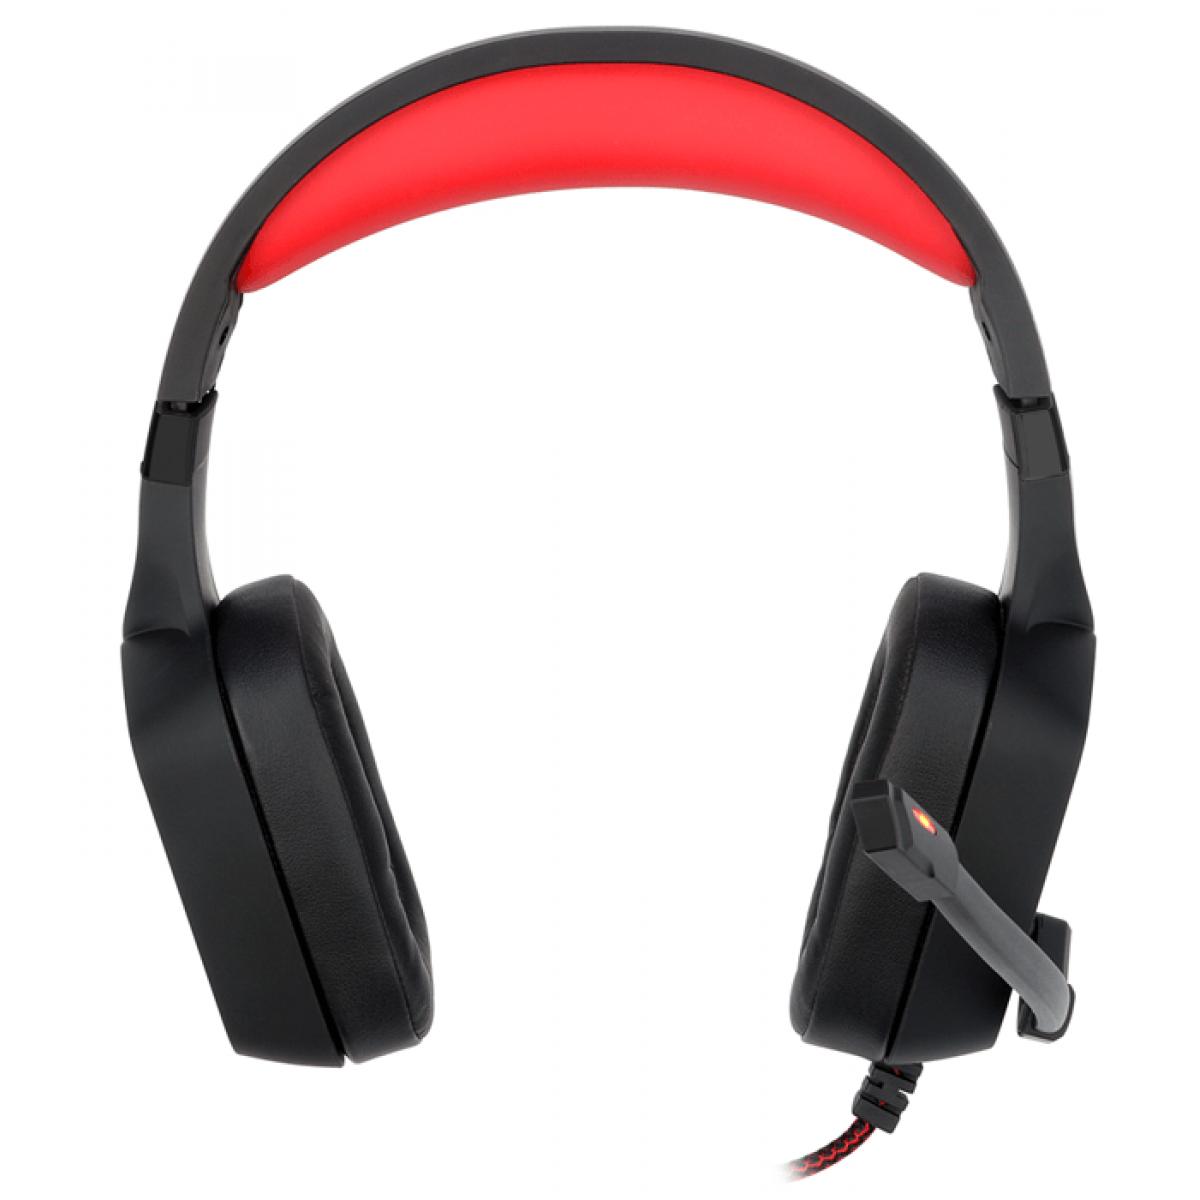 Headset Gamer Redragon Muses H310 Sorround 7.1 USB Preto/Vermelho - Open Box